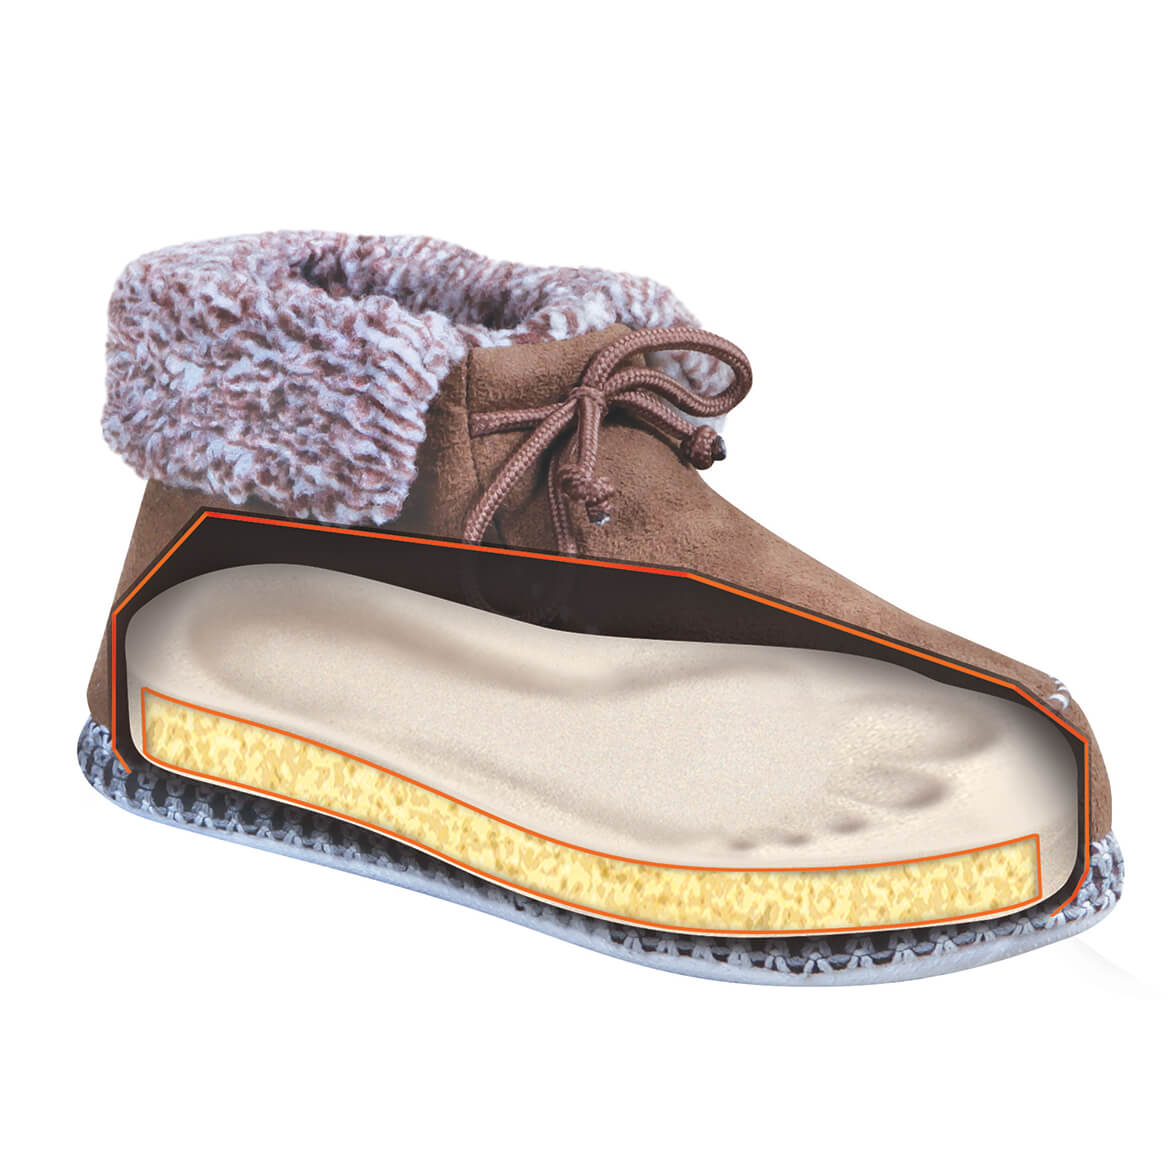 Snug N' Comfy Ankle Boots Mens-370006